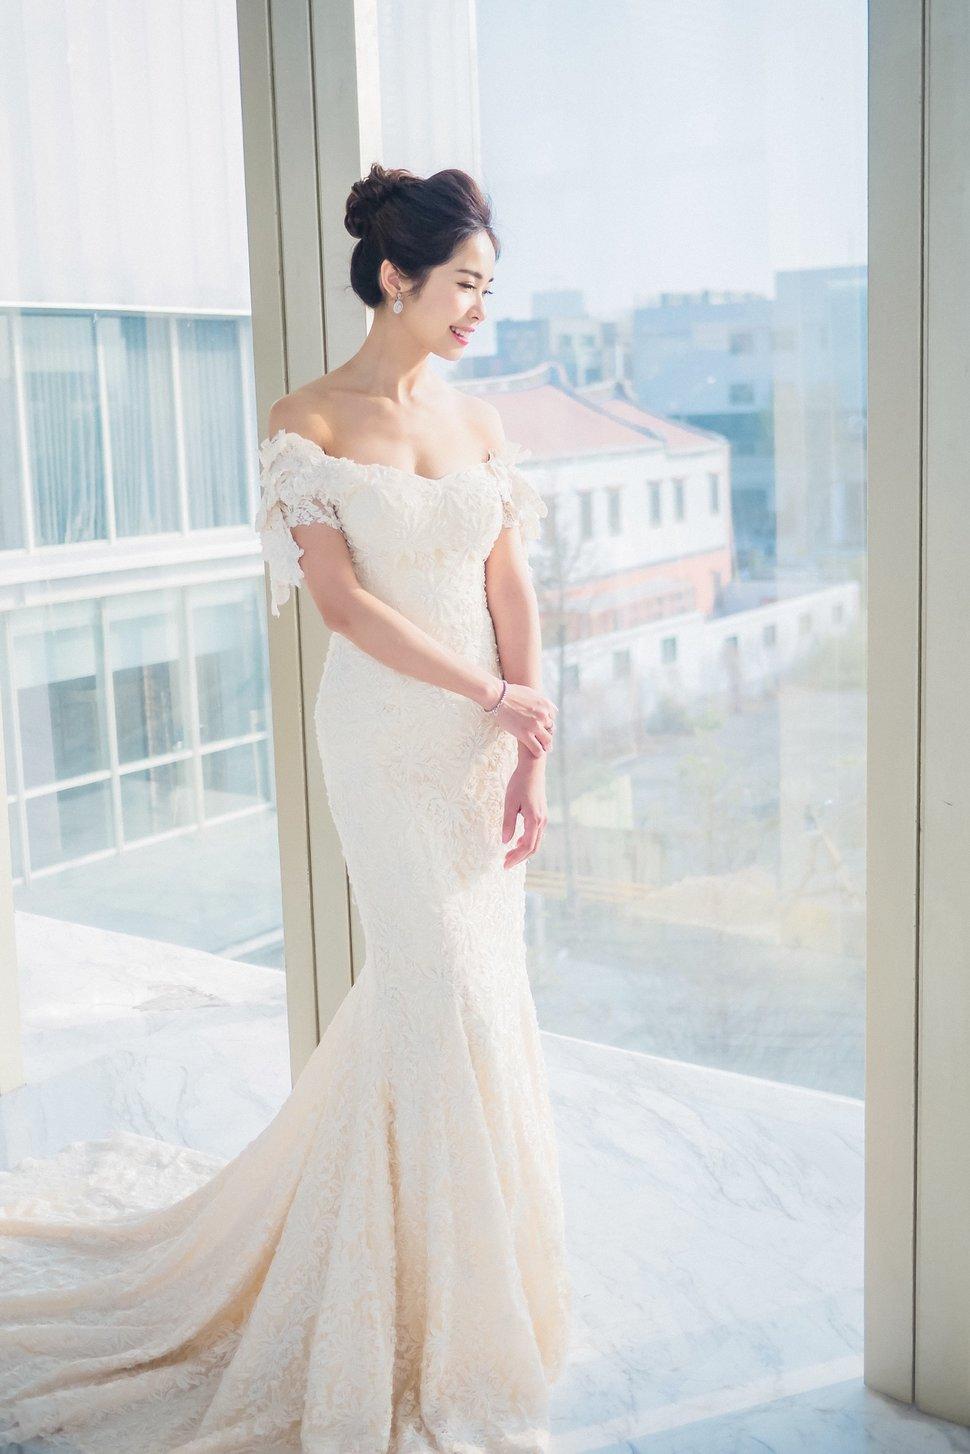 Wed_027 - Dora Lin Makeup新娘秘書《結婚吧》